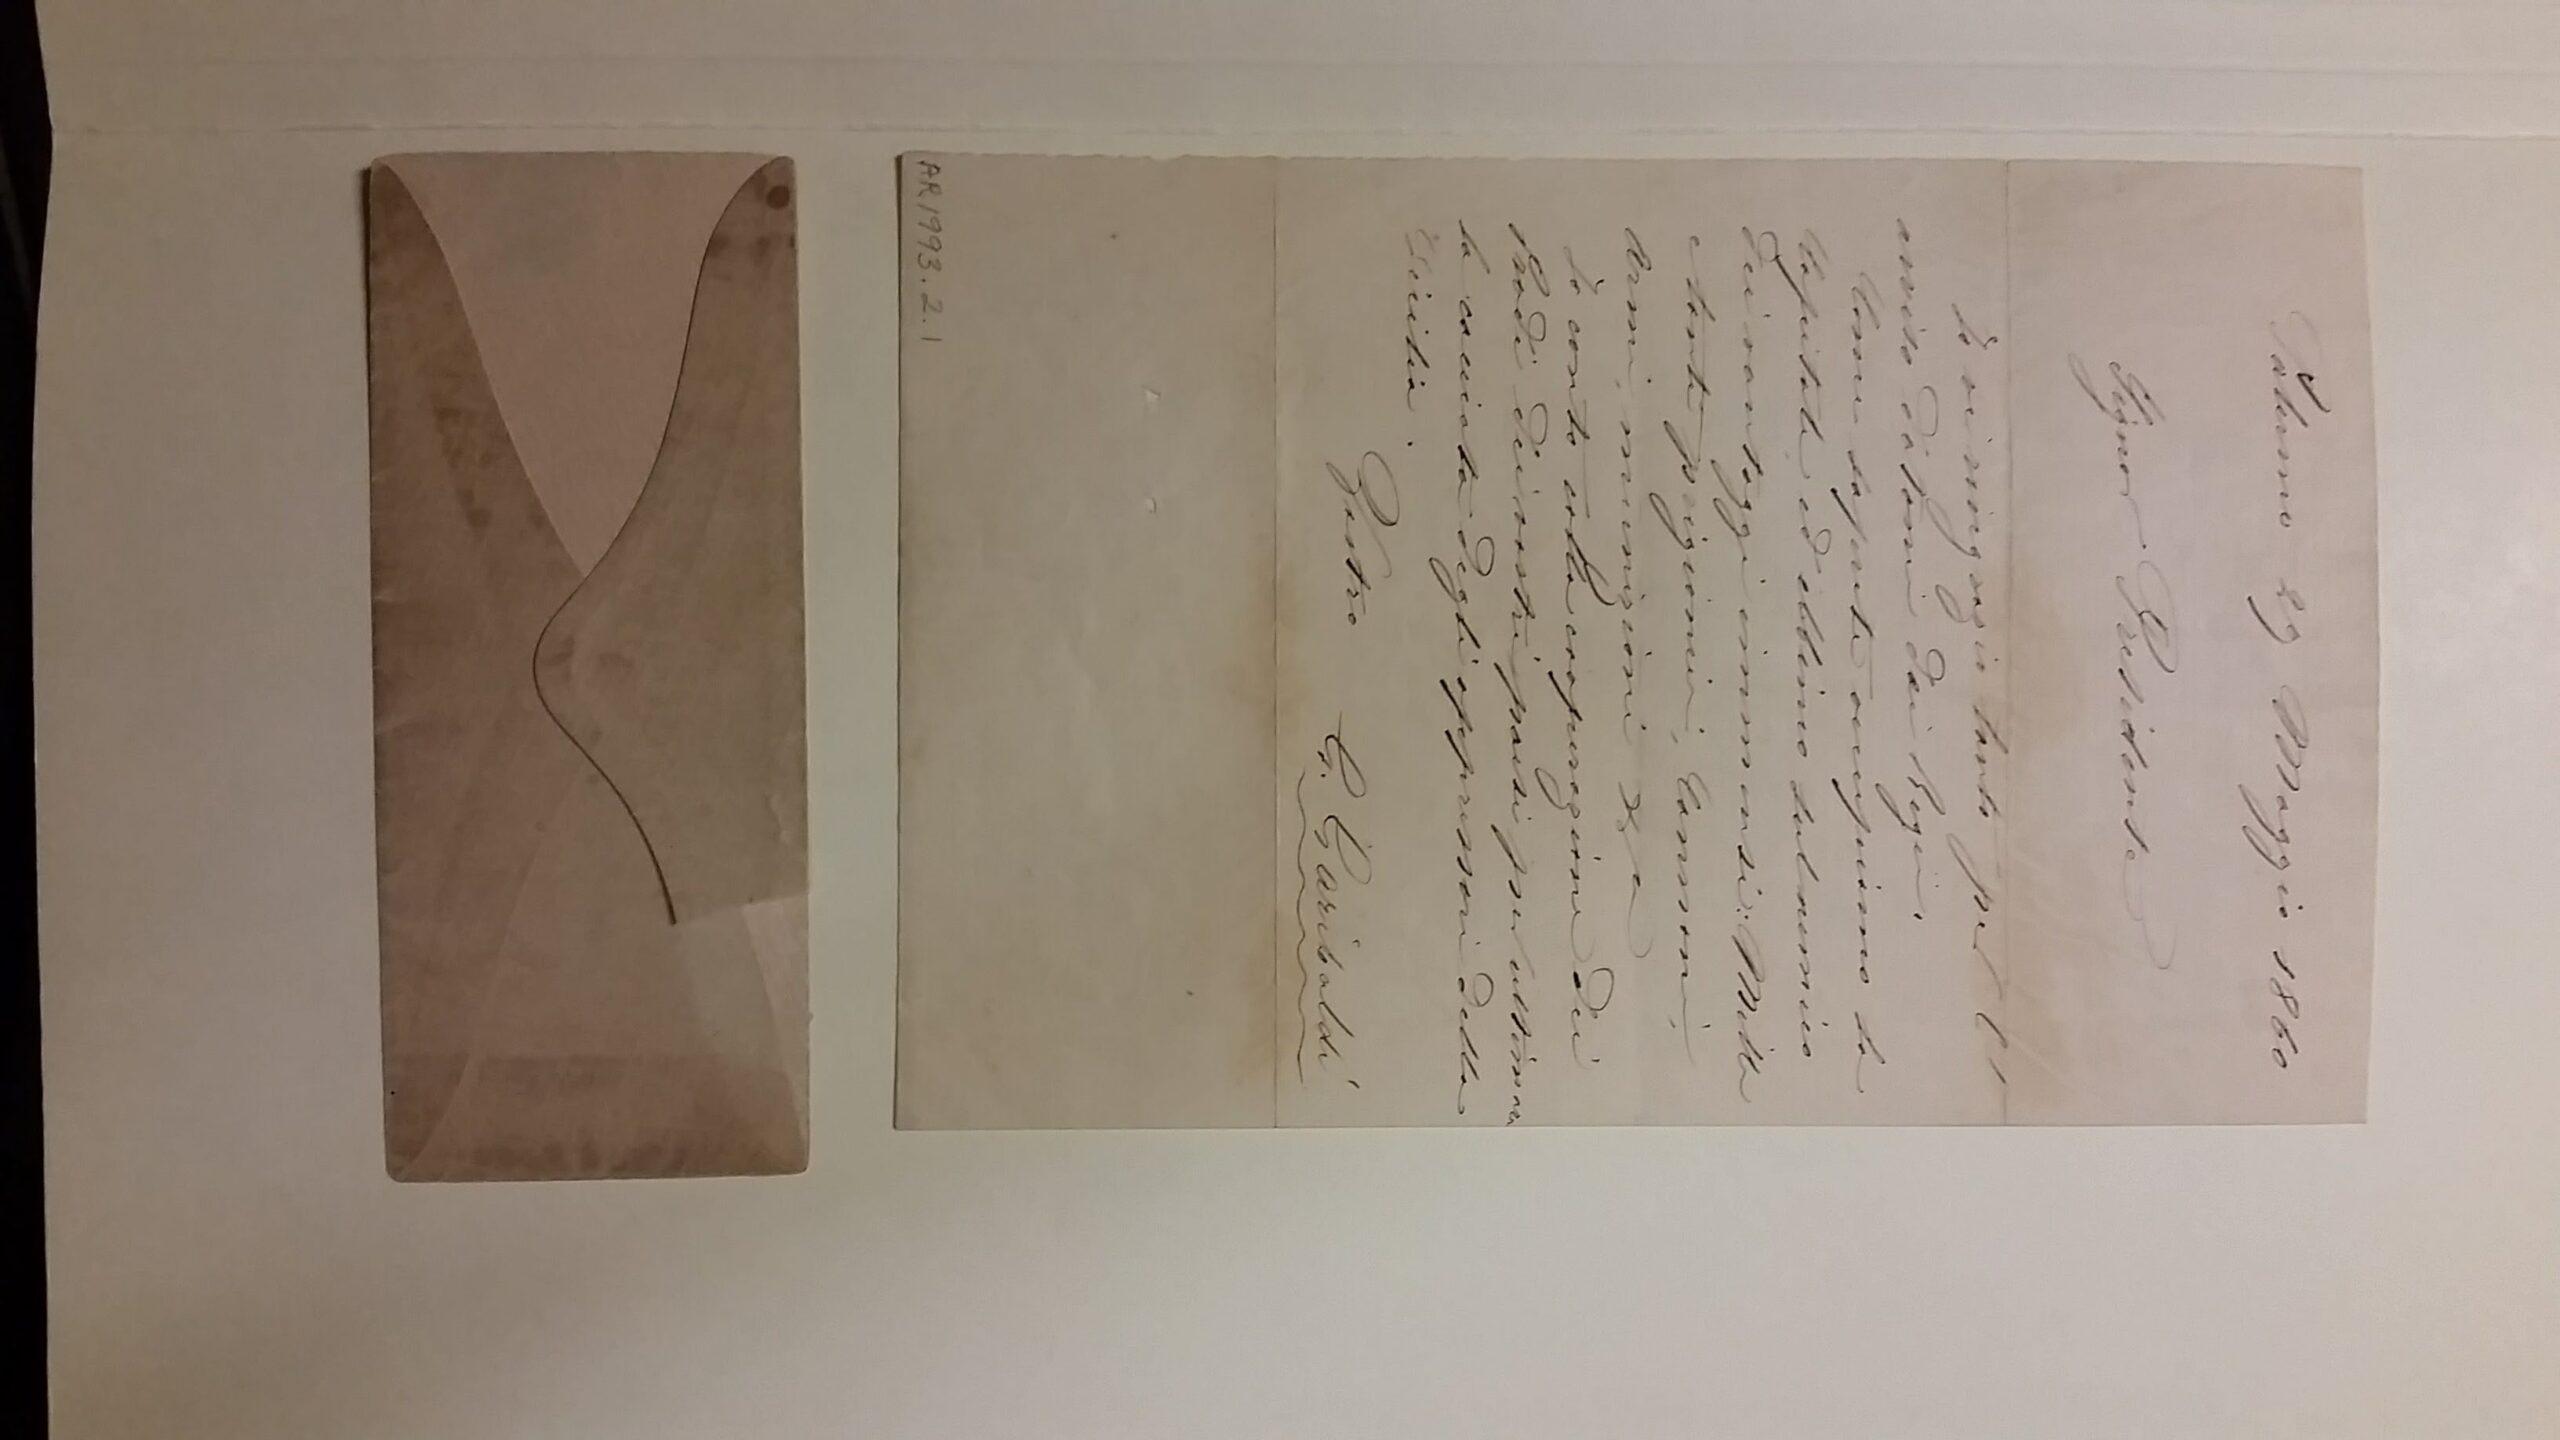 Correspondence from Giuseppe Garibaldi